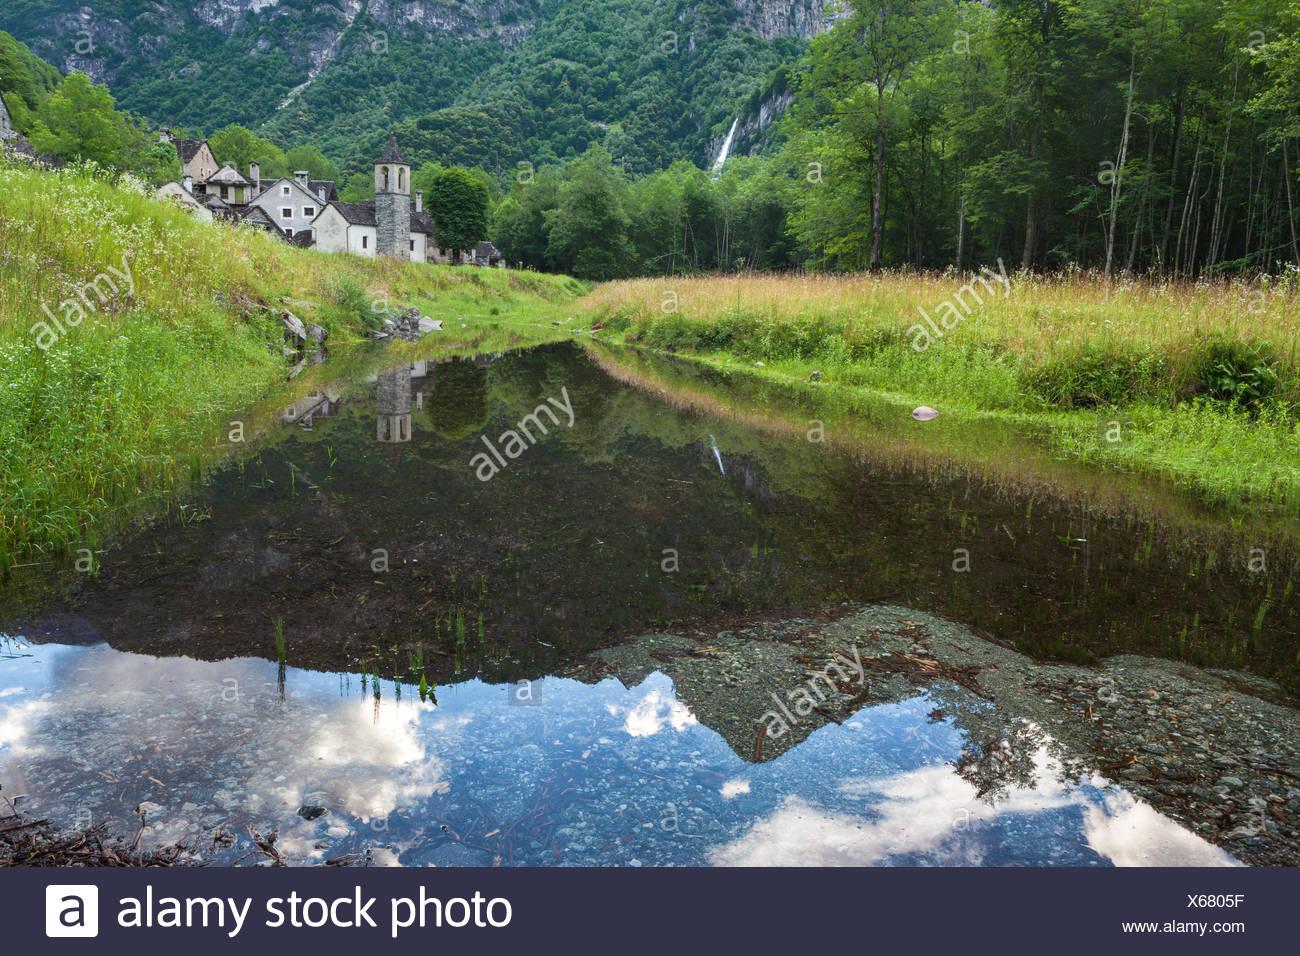 Ritorto, Switzerland, Europe, canton, Ticino, Bavona valley, hamlet, houses, homes, stone houses, reflection - Stock Image